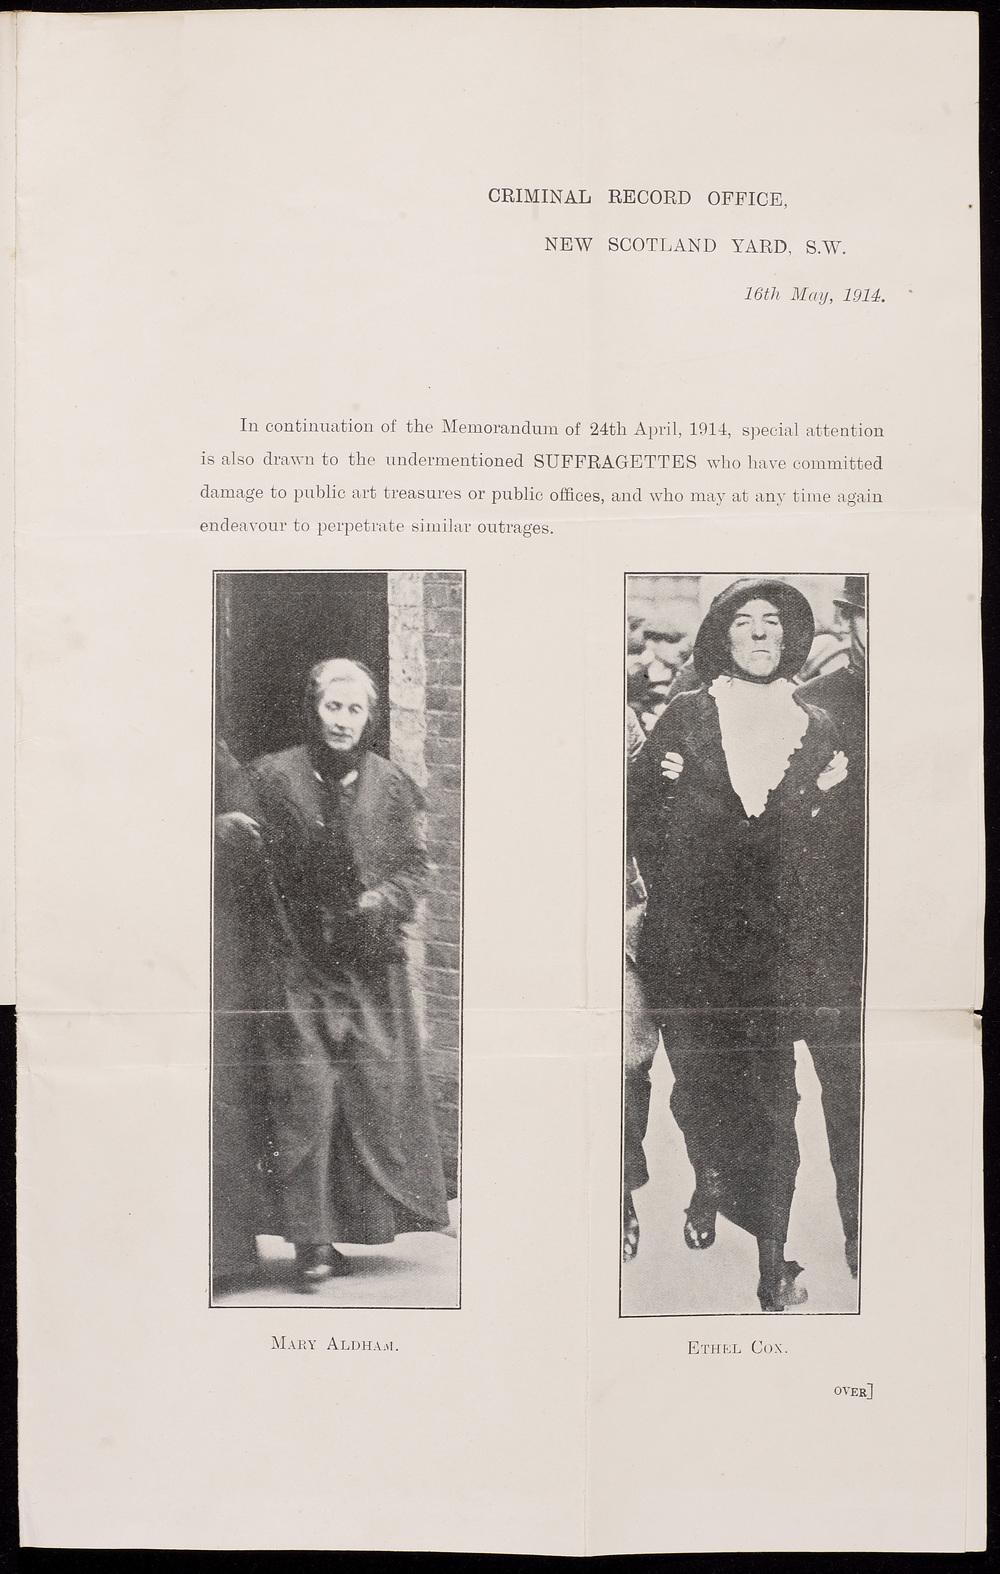 The Criminal Record Office Memorandum, 16 May 1914